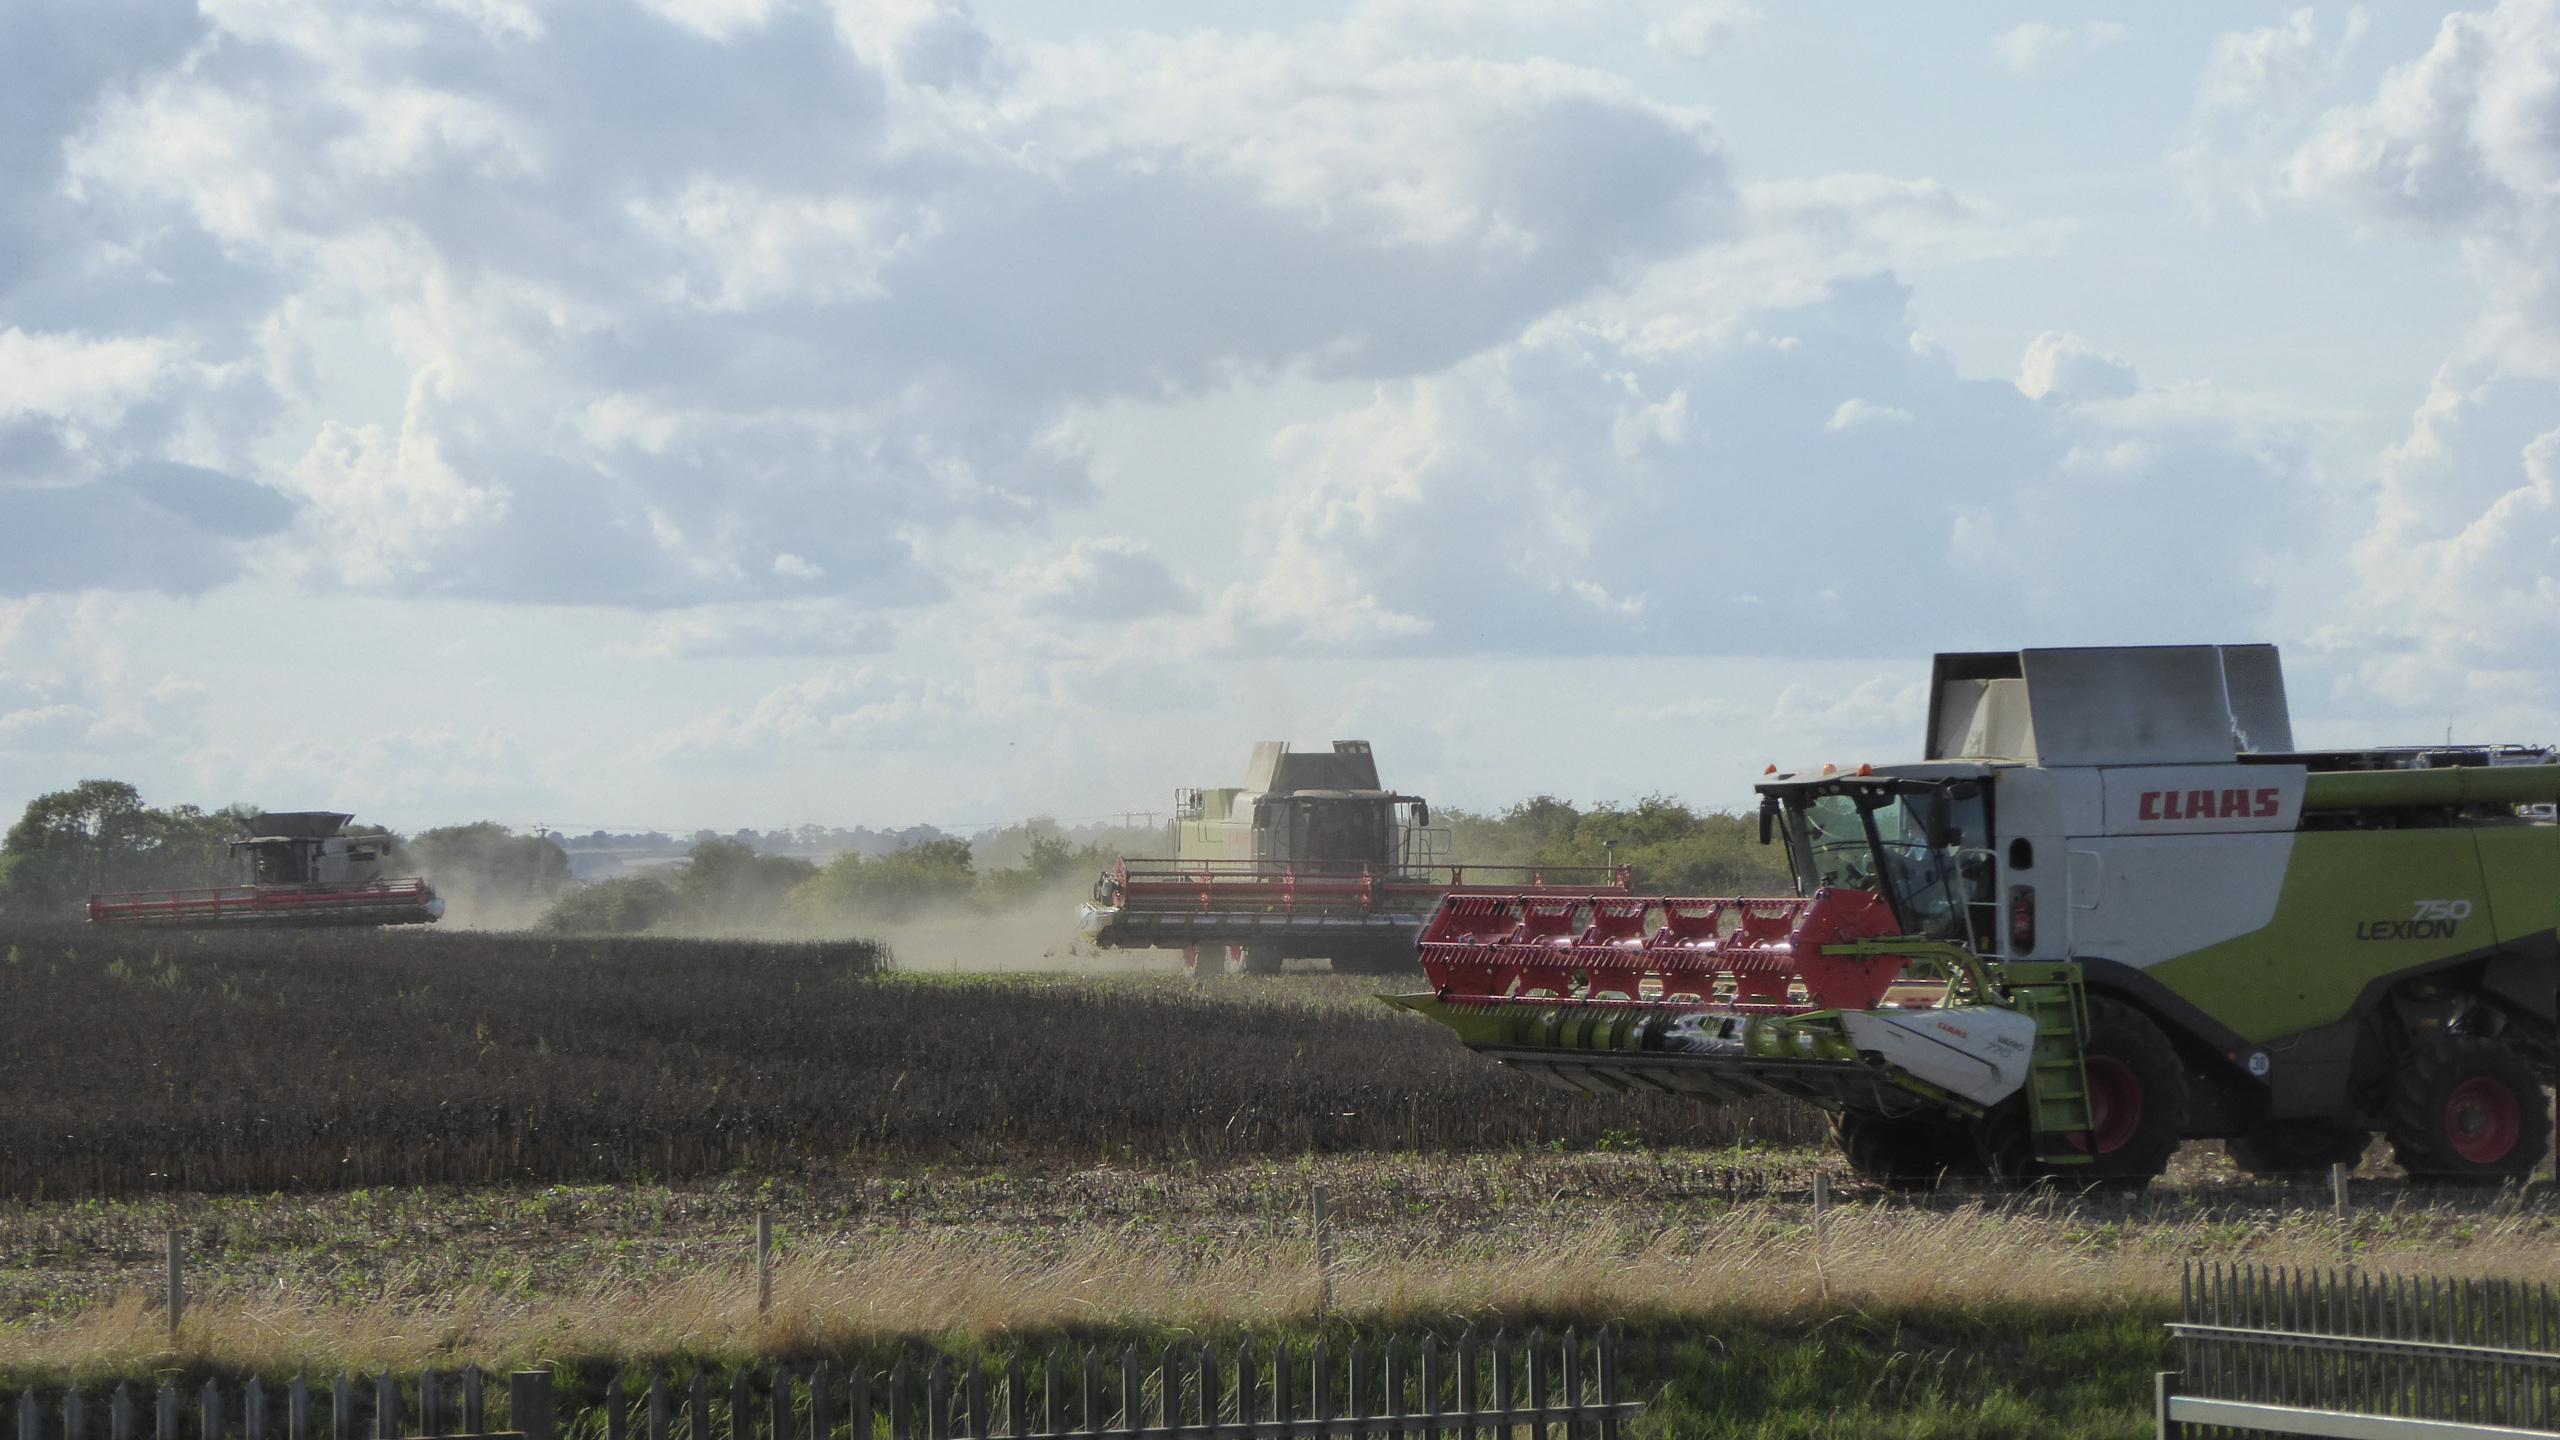 Three Claas Combines Harvesting Beans - 100ft Header Total Width!